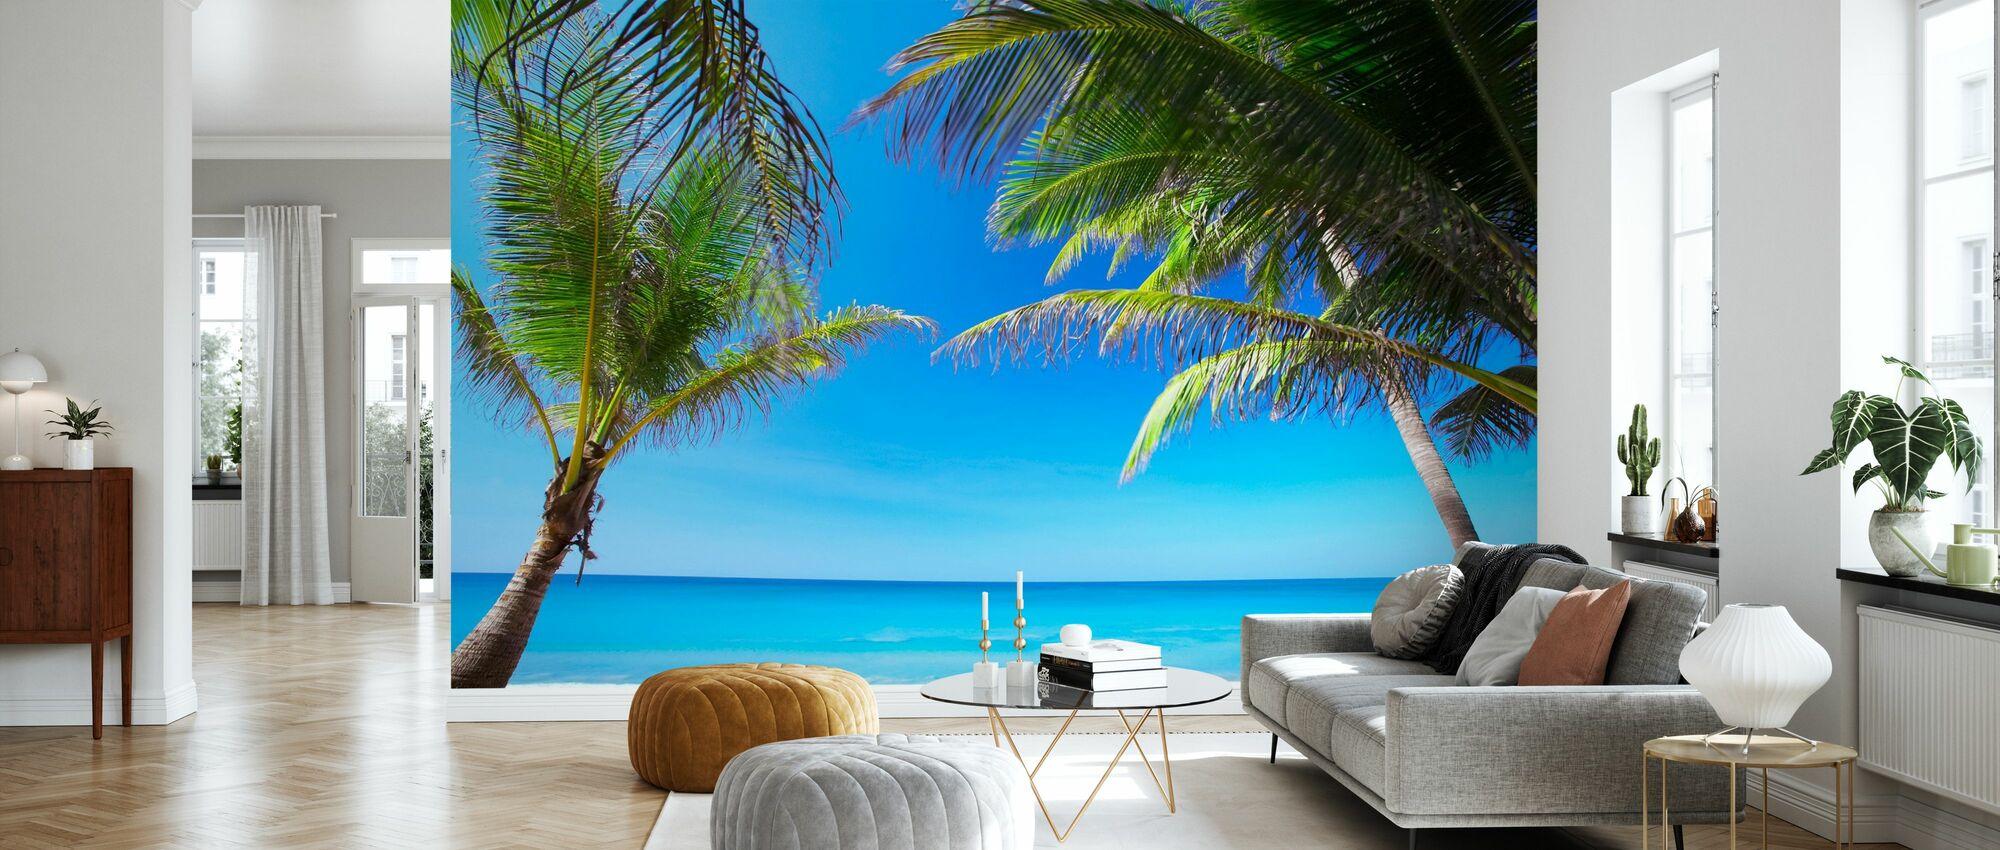 Relaxation - Wallpaper - Living Room